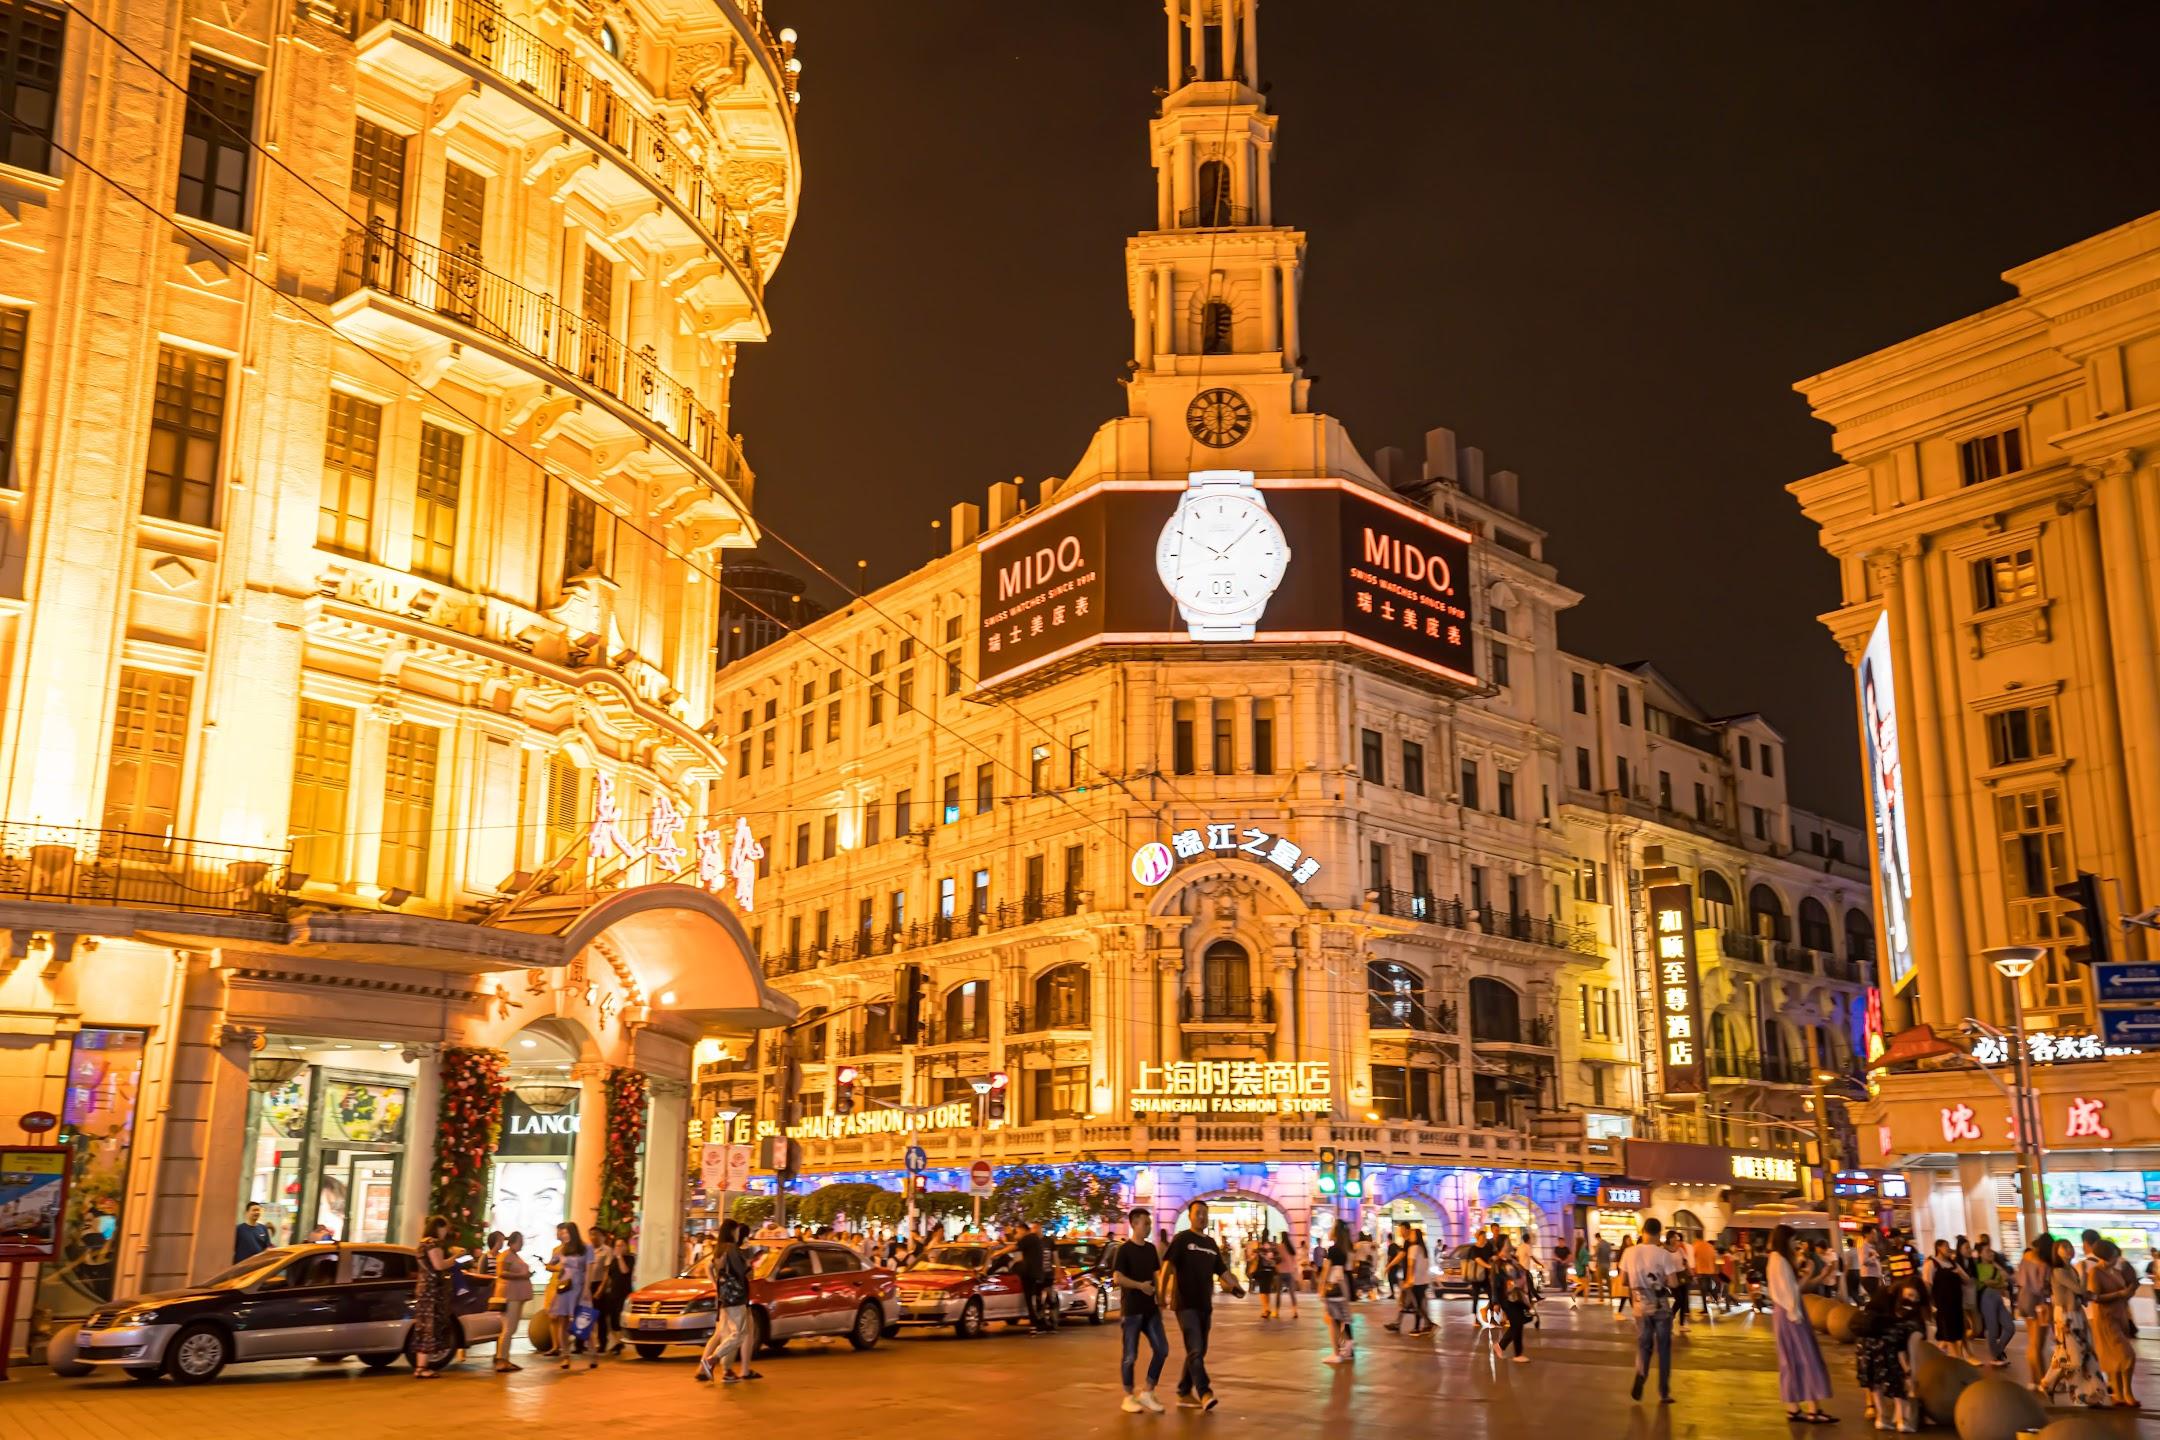 上海 南京東路 夜 上海時装商店 (Shanghai Fashion Store)1